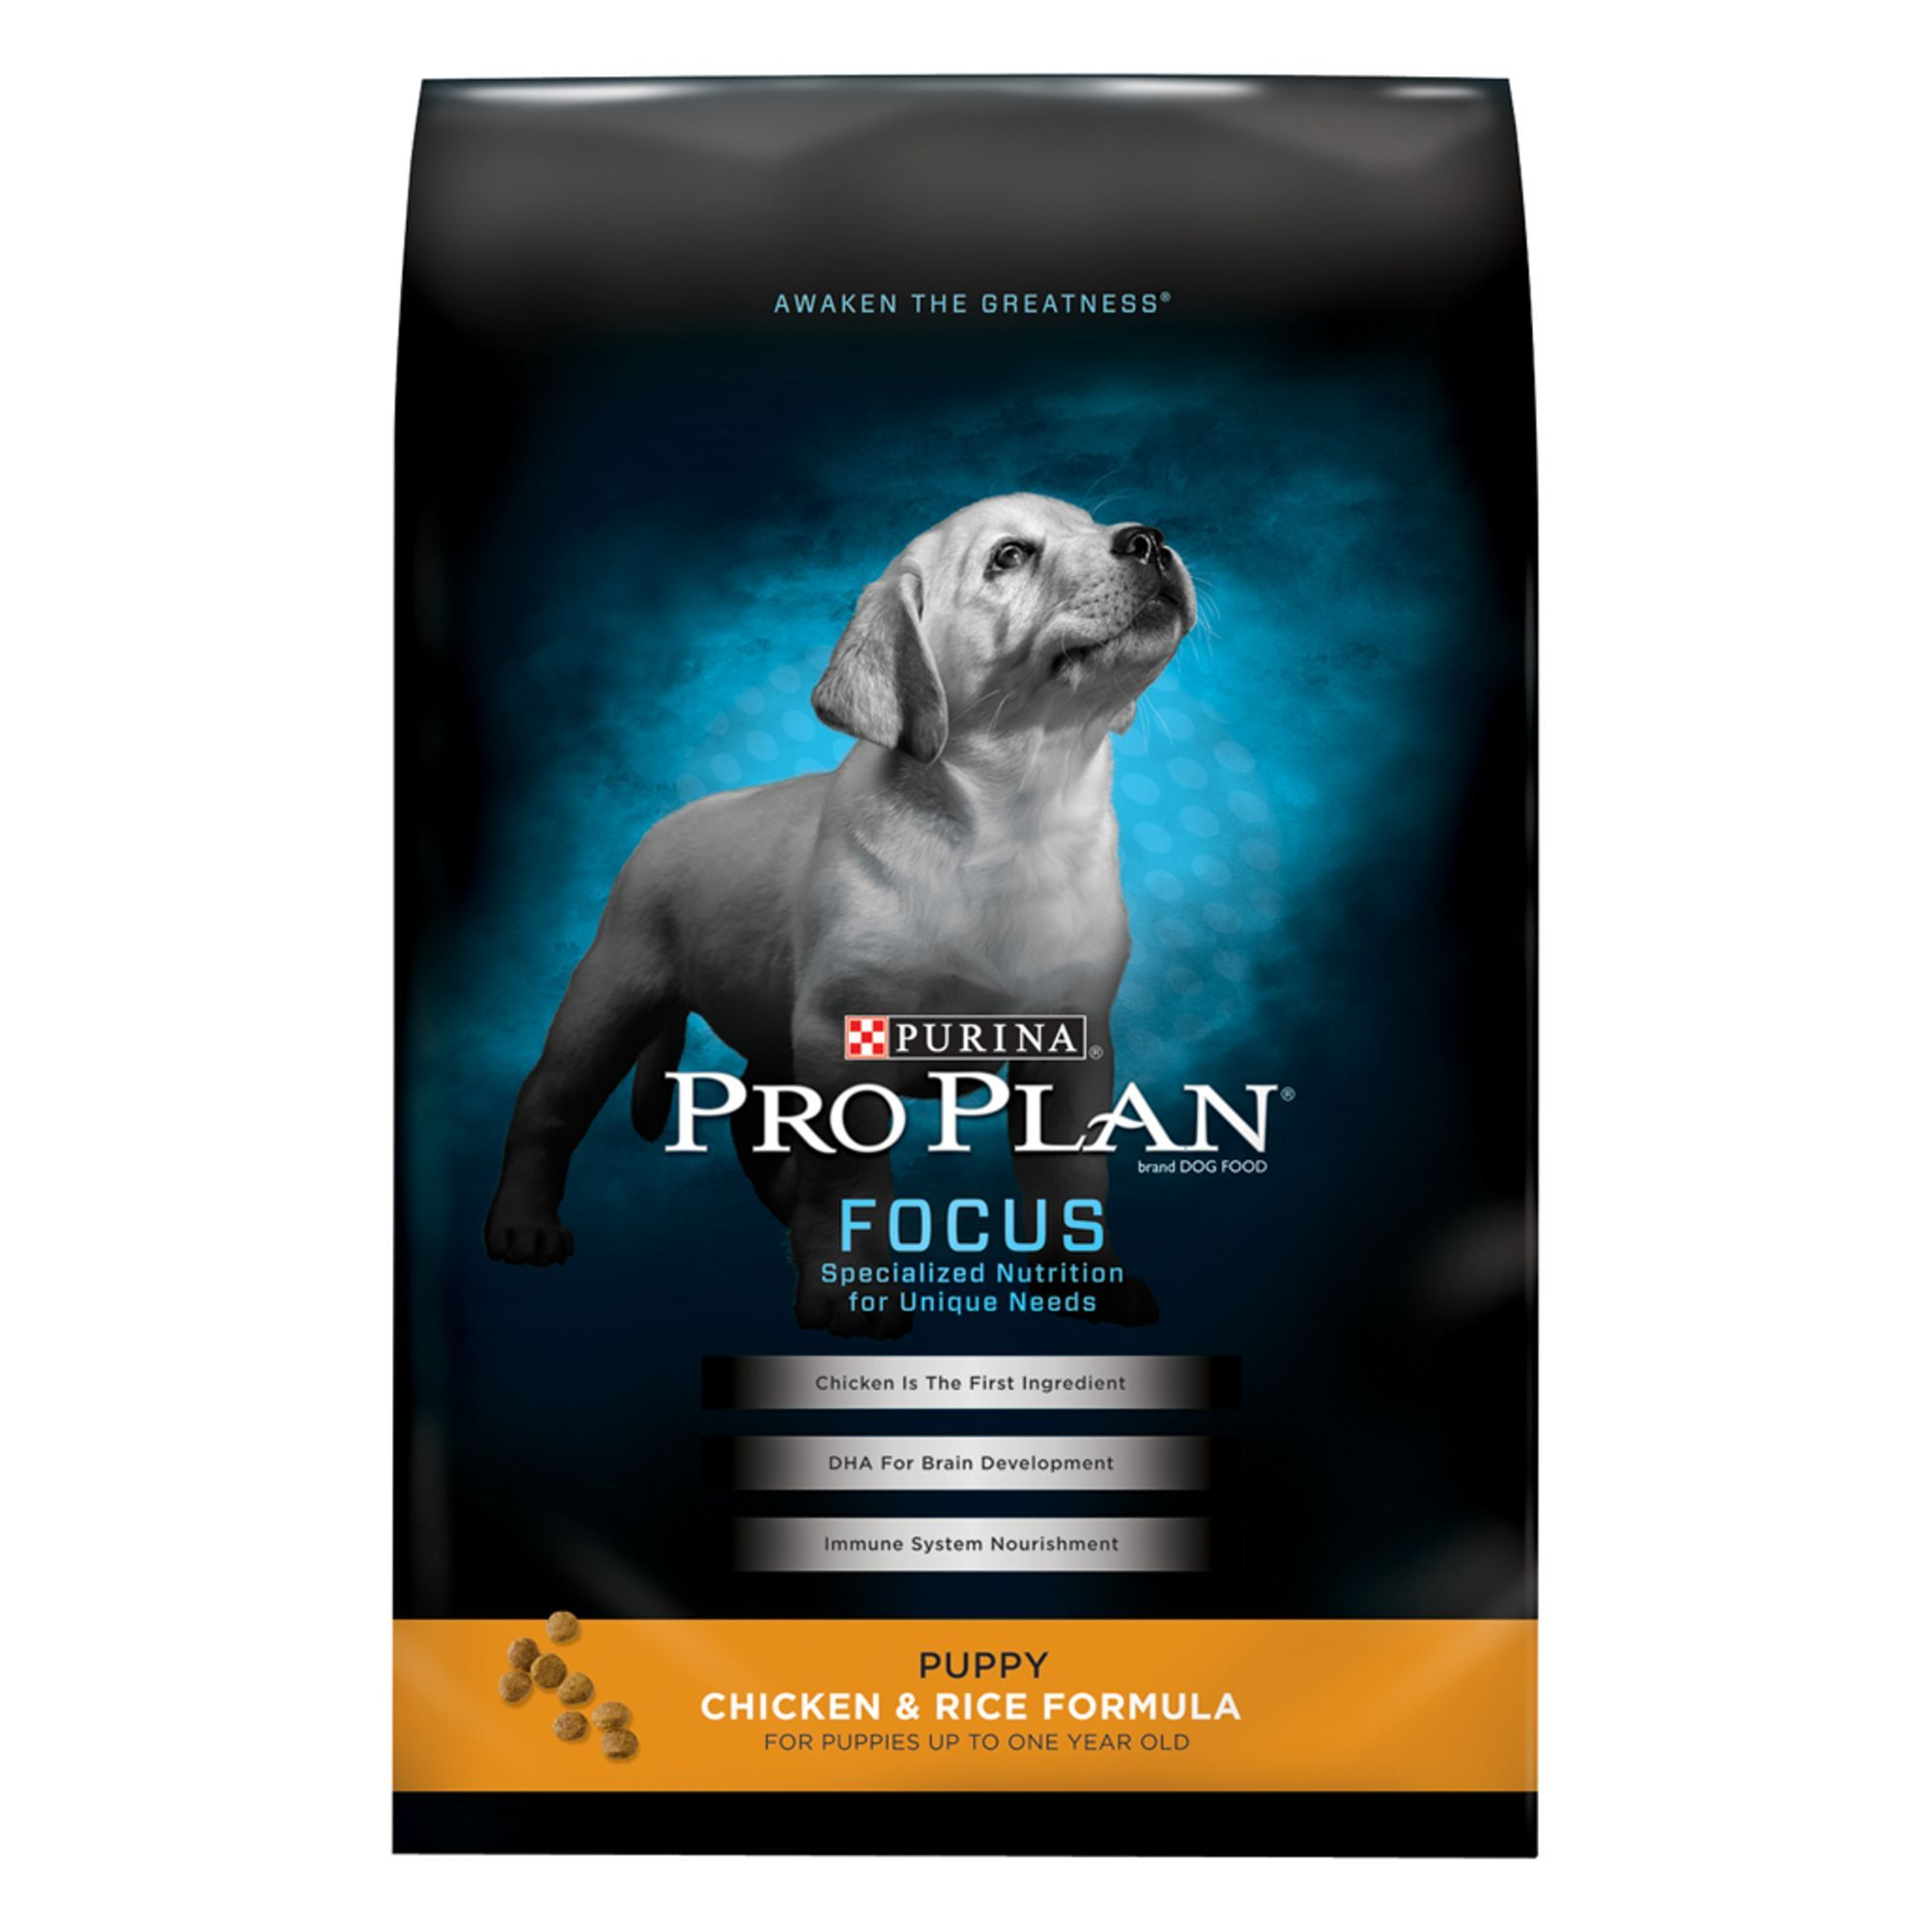 Purina Pro Plan Puppy Food Size 34 Lb Bone Copper Zinc Chicken